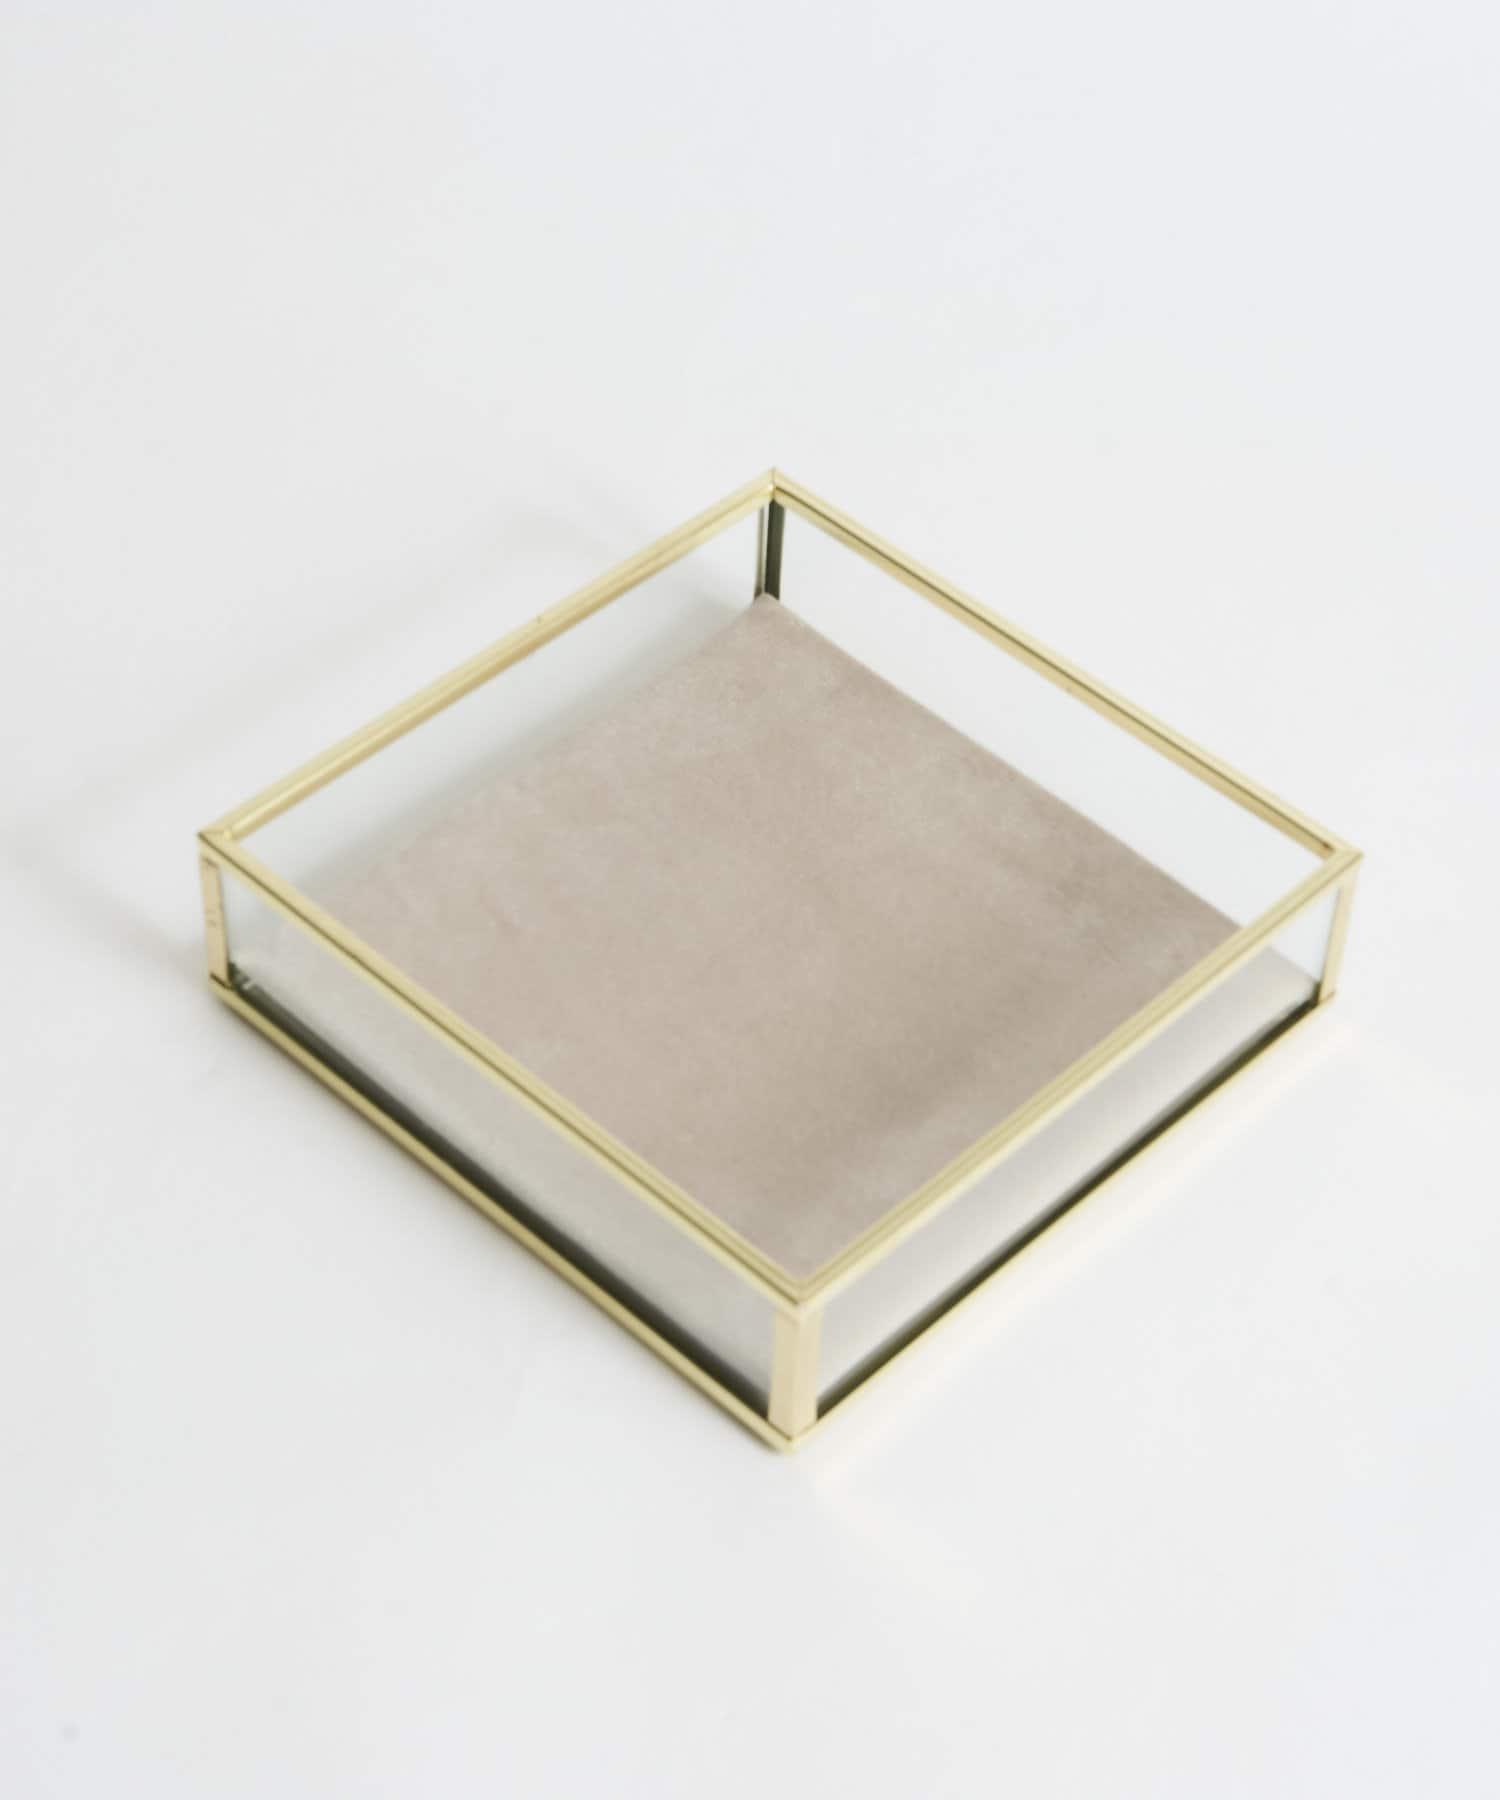 Lattice(ラティス) 《オシャレに収納》GOLDFRAME ベロアトレイ(正方形)